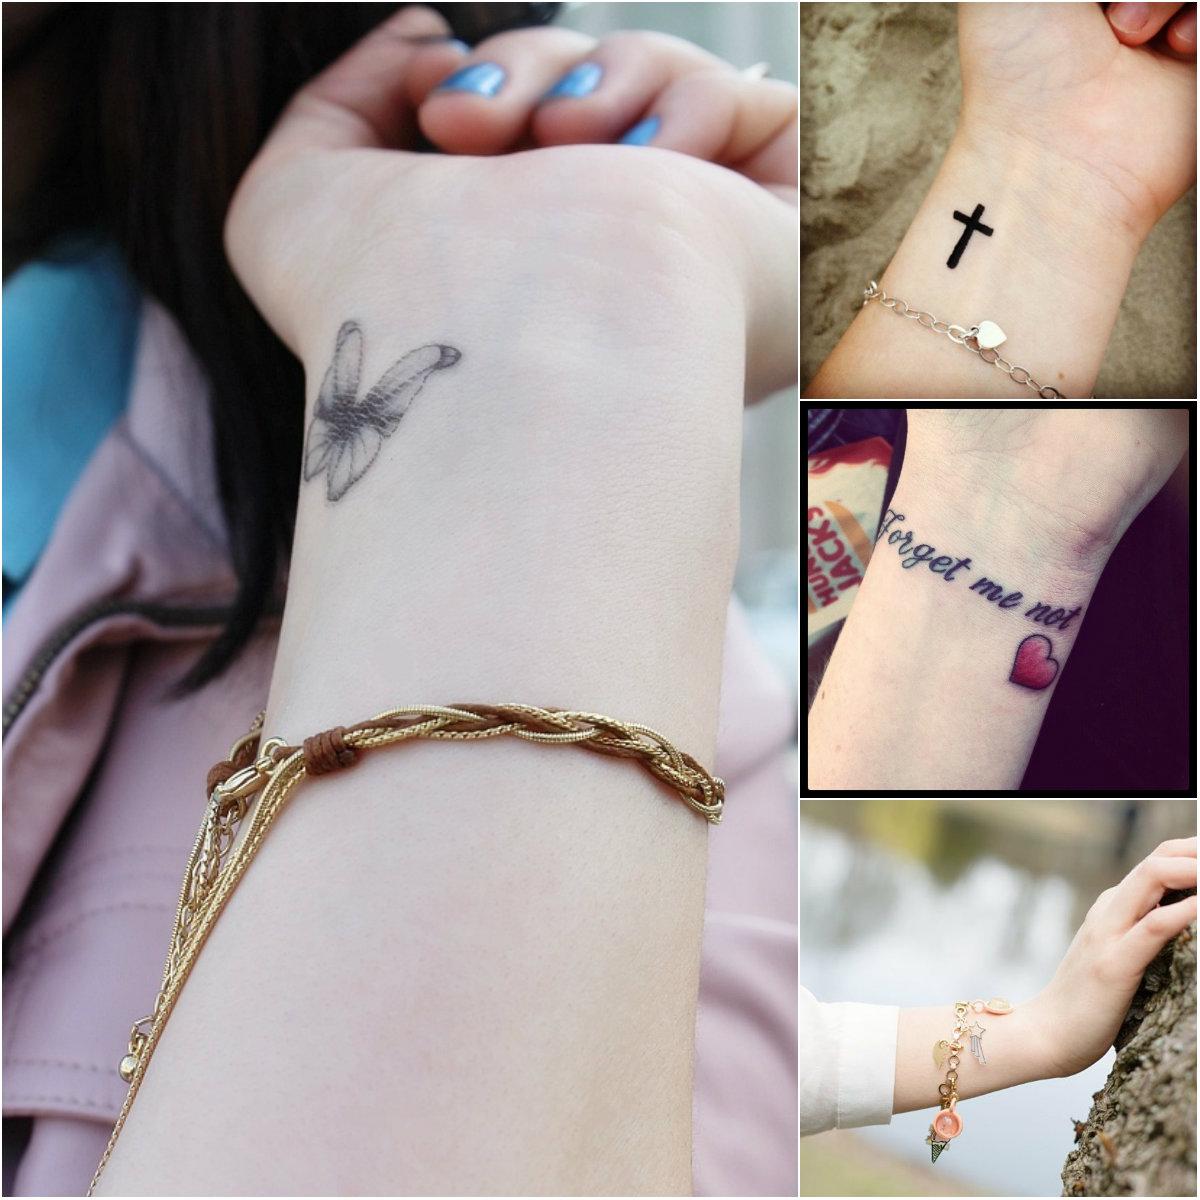 Highly Cute And Sensational Wrist Tattoo Designs